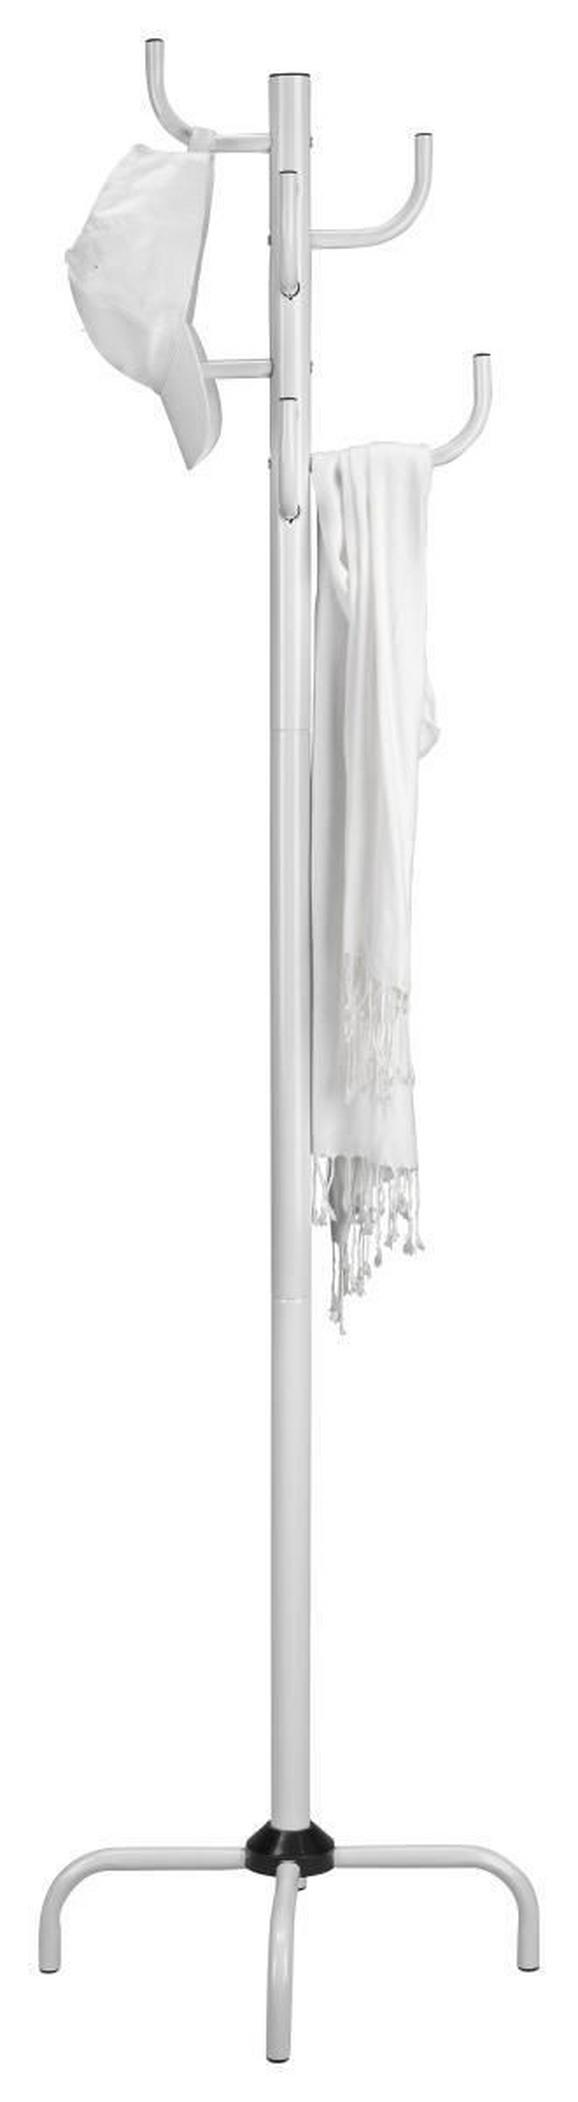 Samostoječ Obešalnik Cactus - Konvencionalno (50/178/50cm) - Mömax modern living